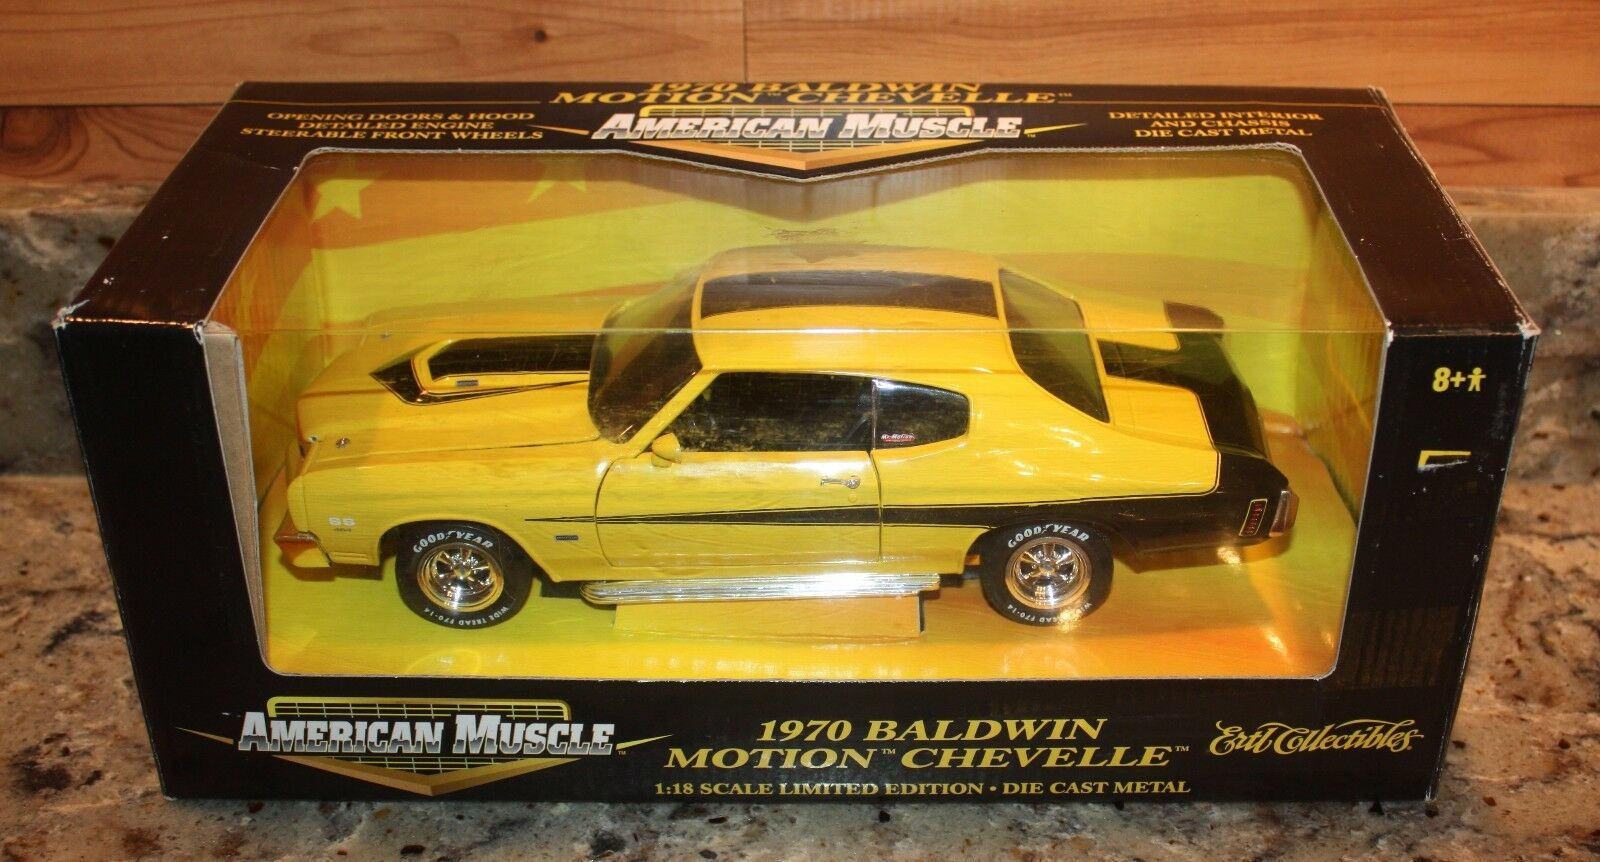 ordenar ahora Ertl 1970 1970 1970 Baldwin Motion American Muscle Chevelle SS 454 escala 1 18 DIE-CAST  compra en línea hoy